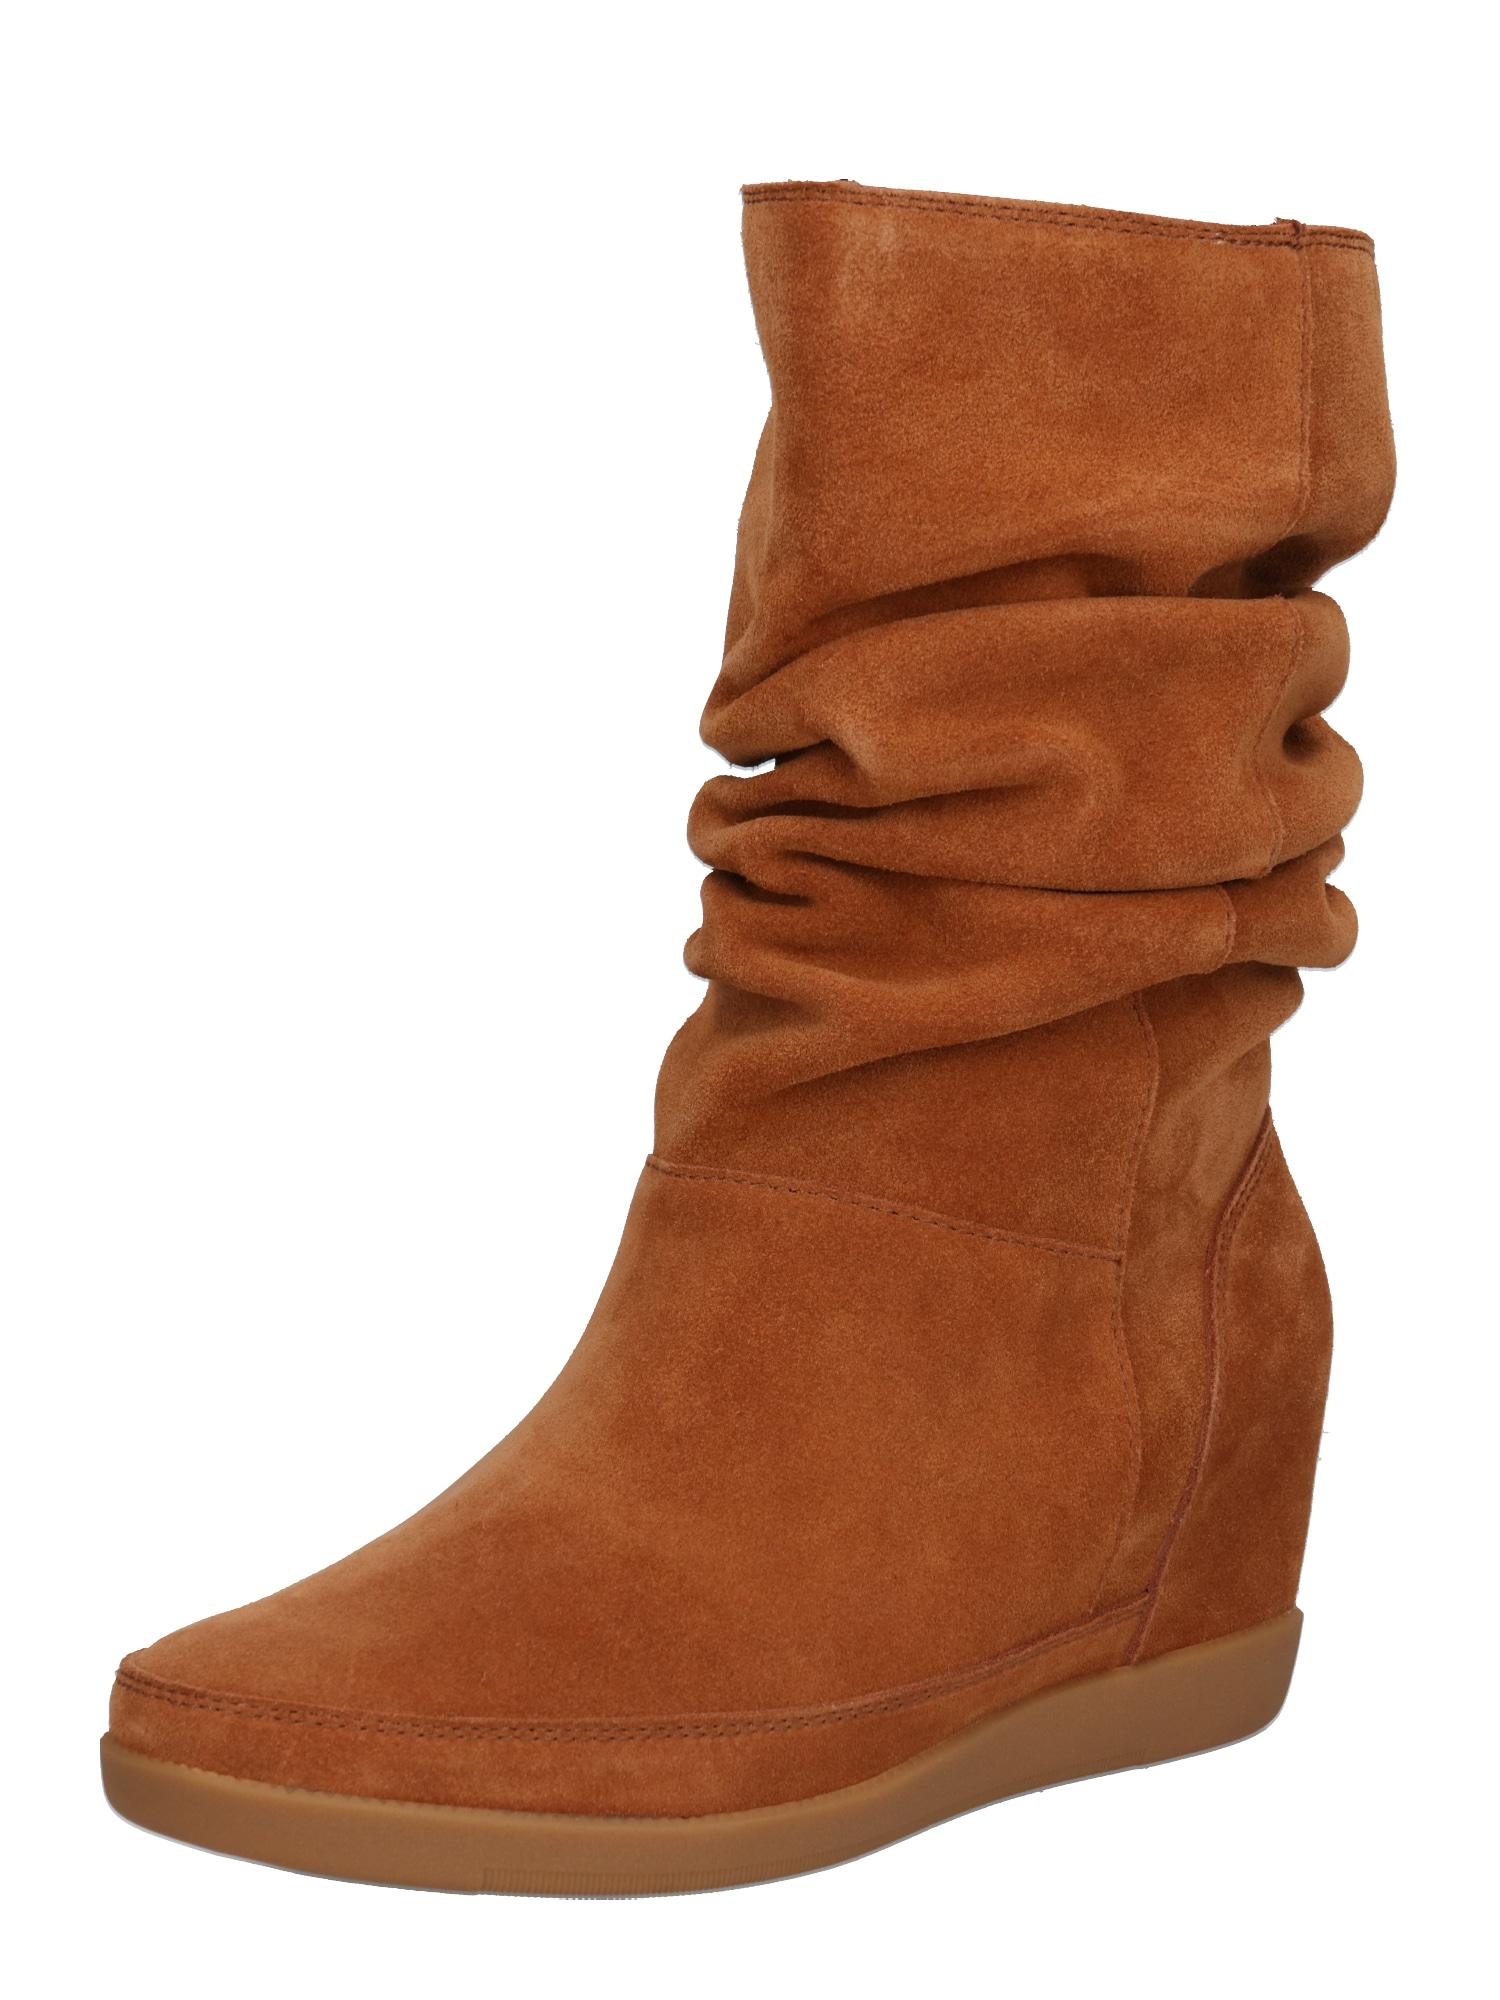 Shoe The Bear Čižmy  hnedá